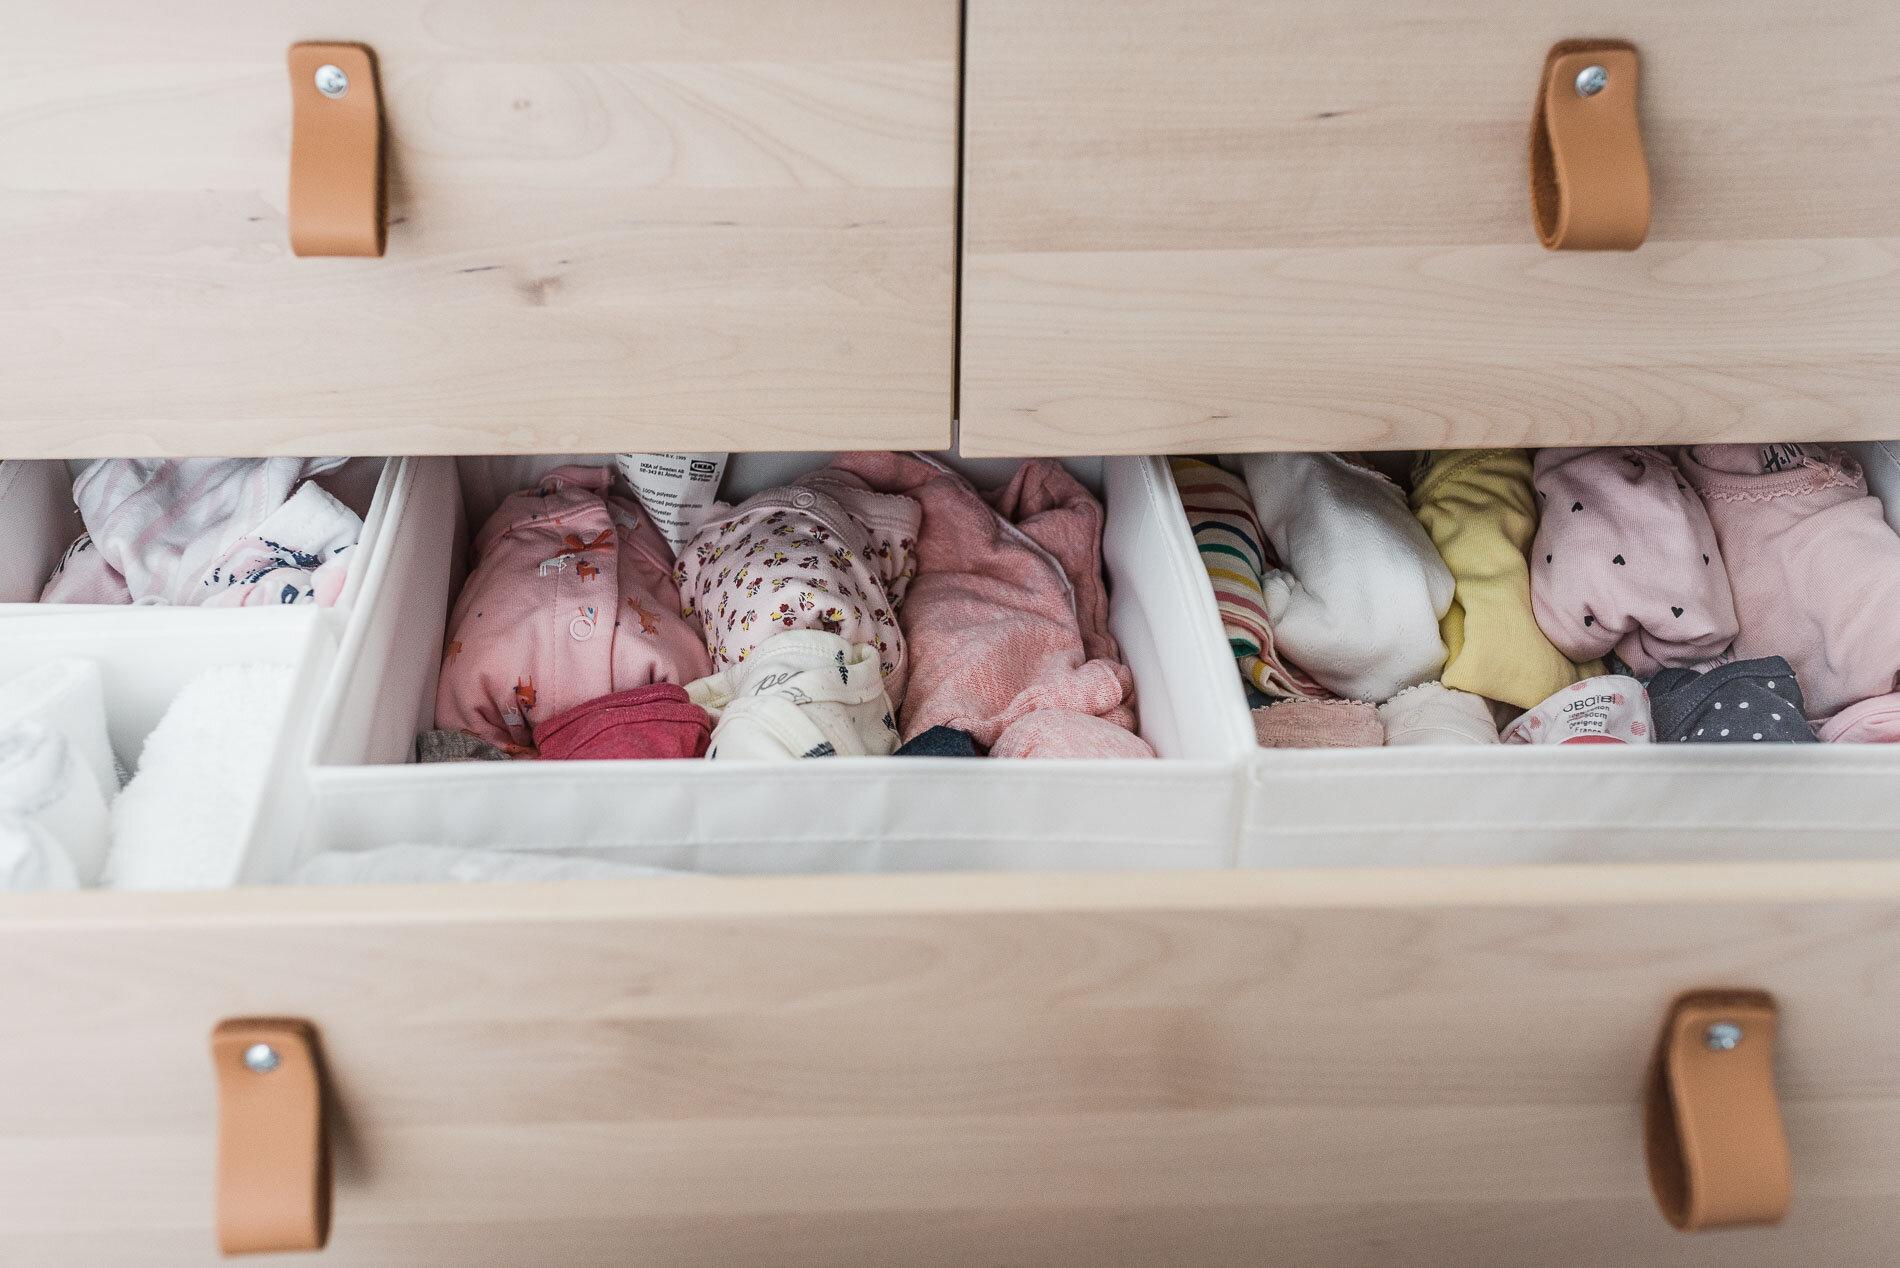 newborn's outfit in the dresser